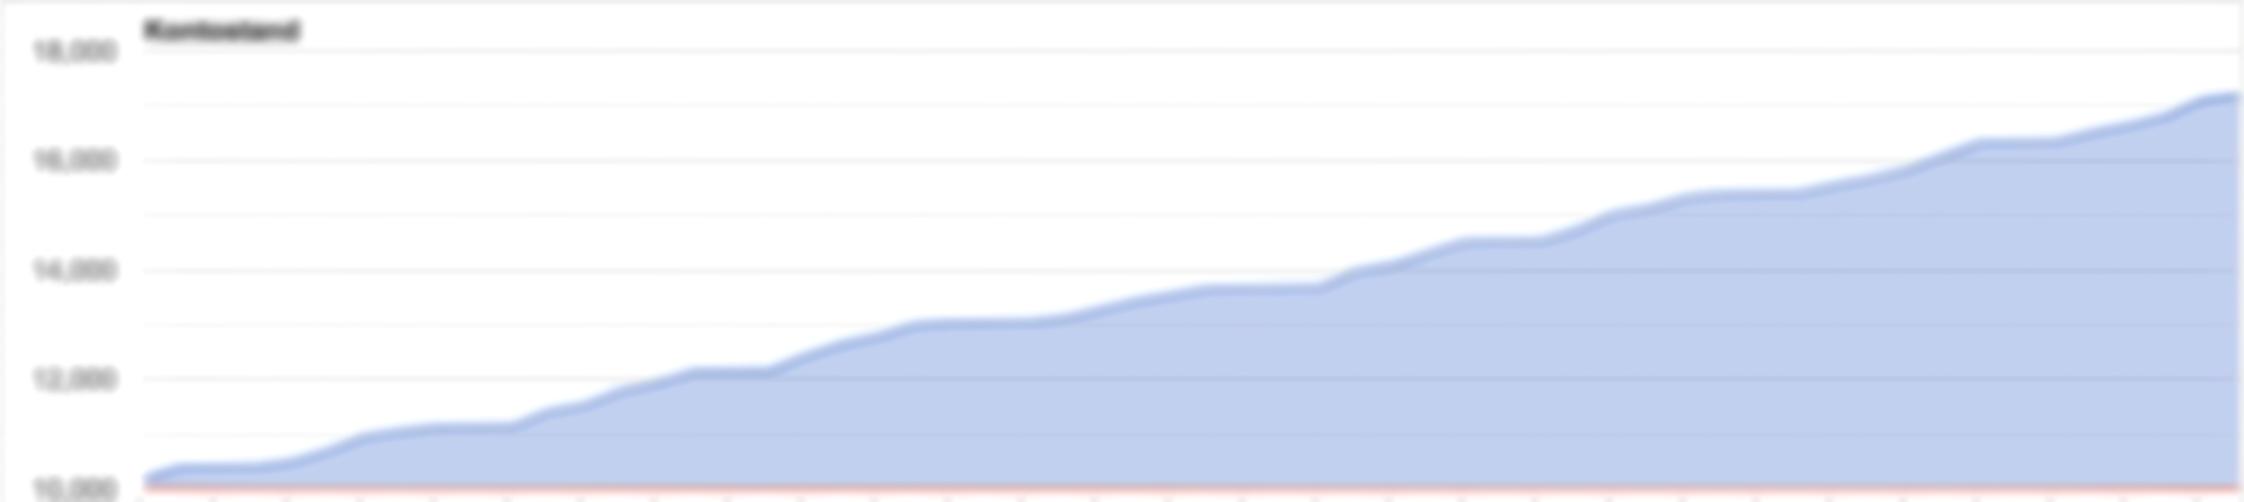 Trading Chart Blur